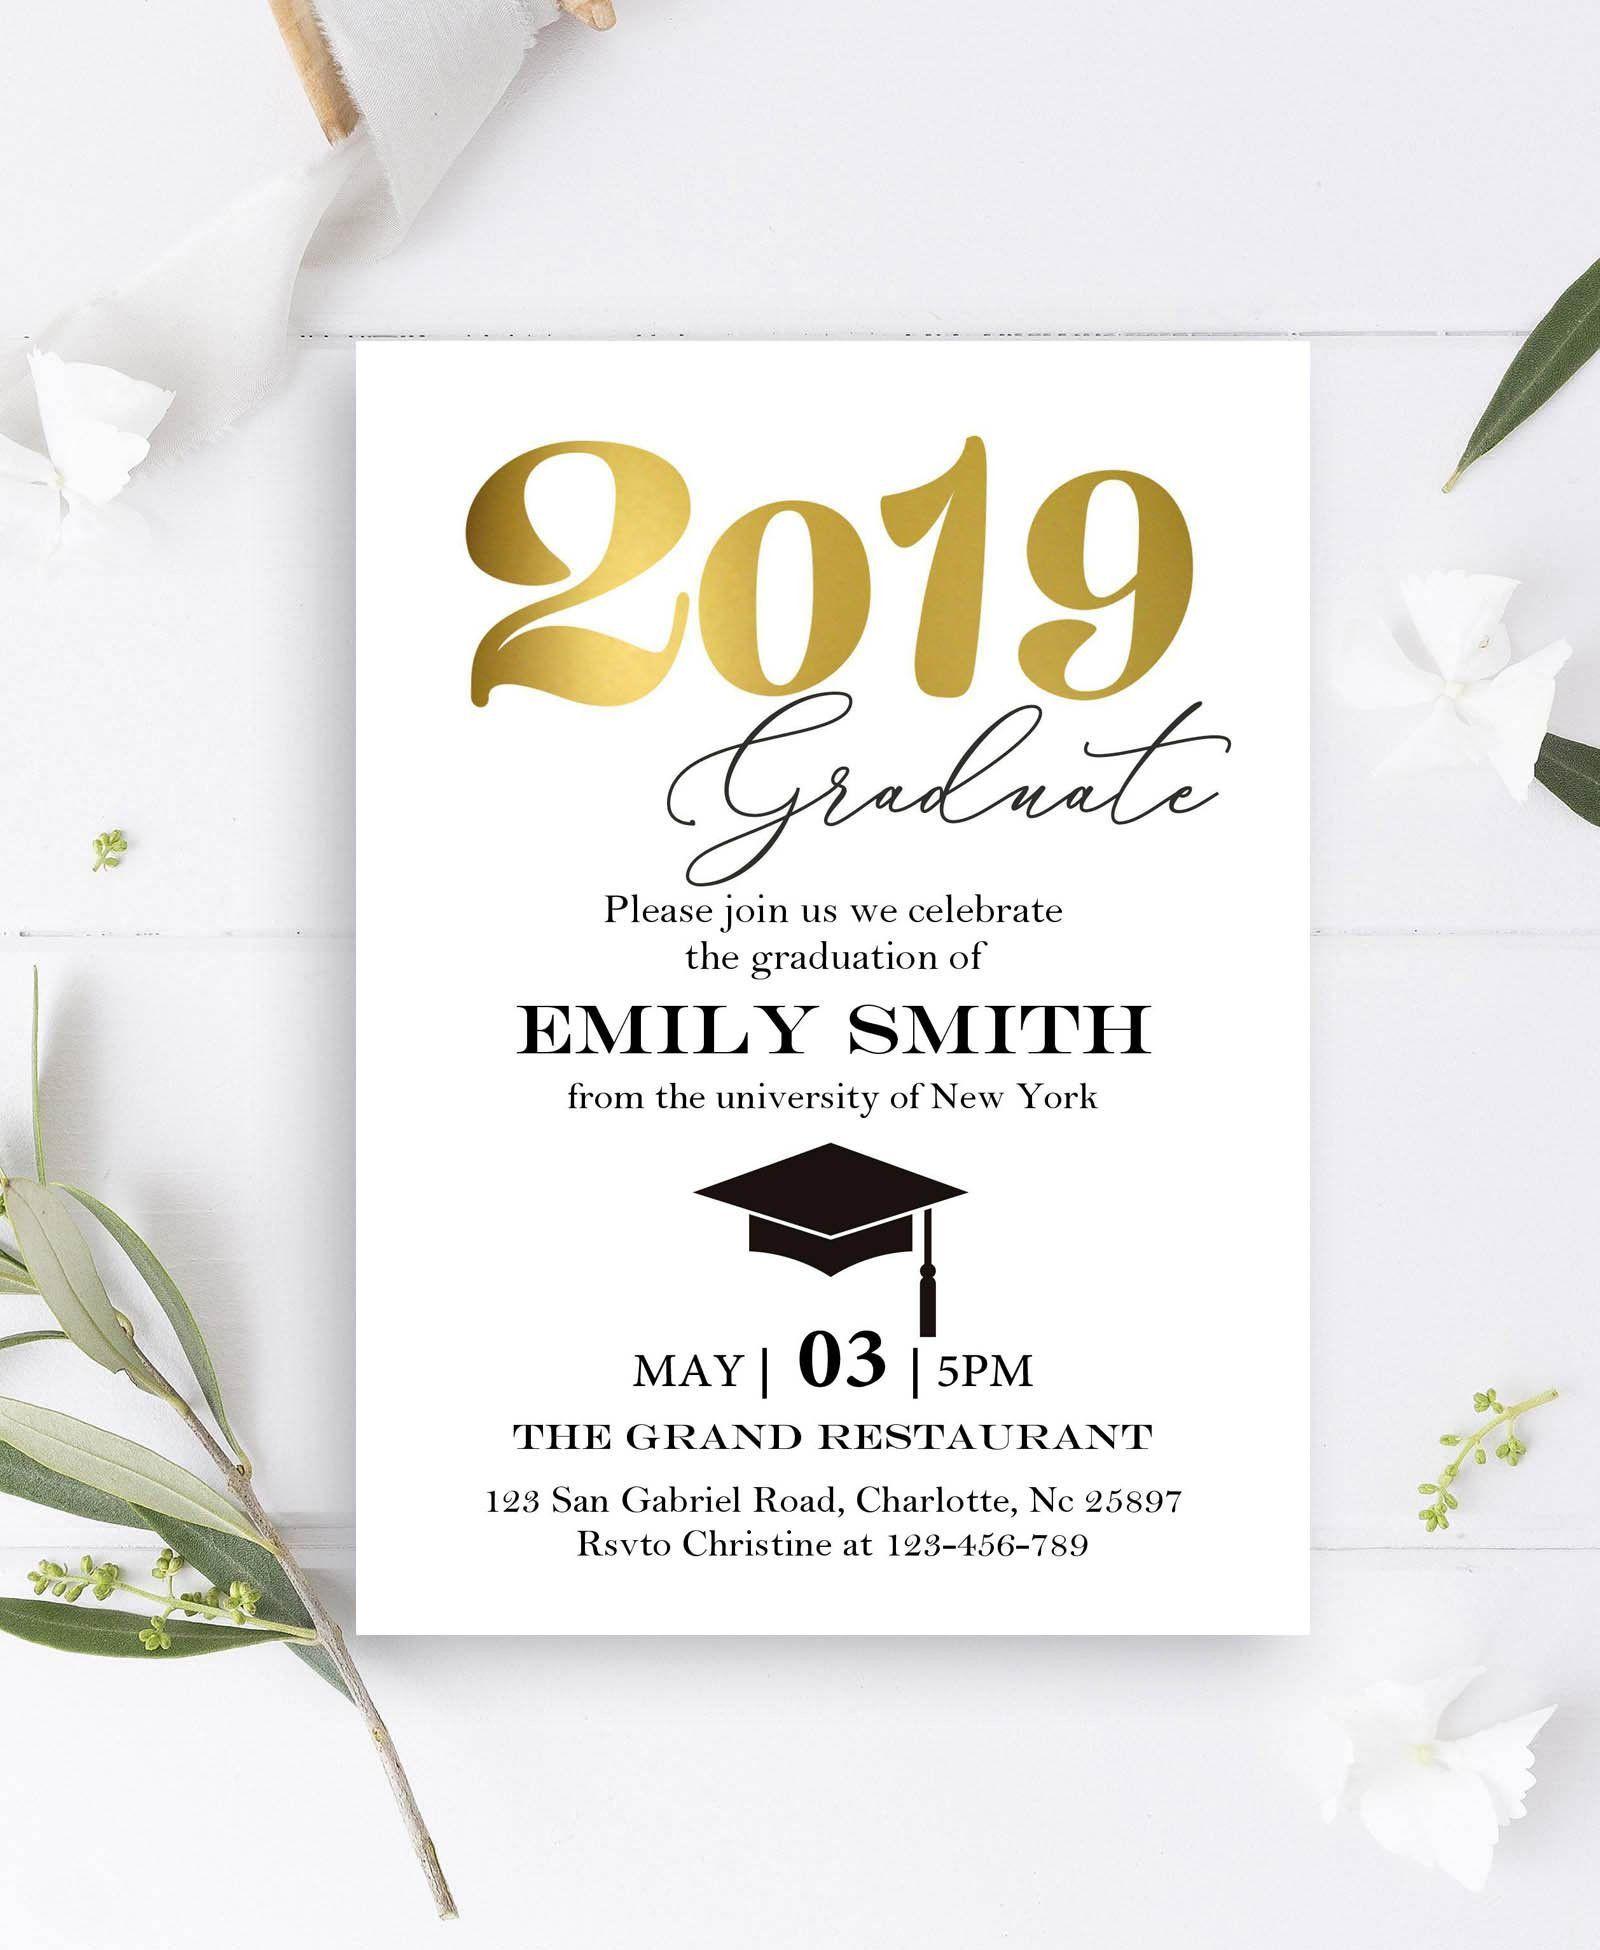 Graduation Card Template Word Graduation Invitations Template Graduation Invitation Wording Graduation Card Templates